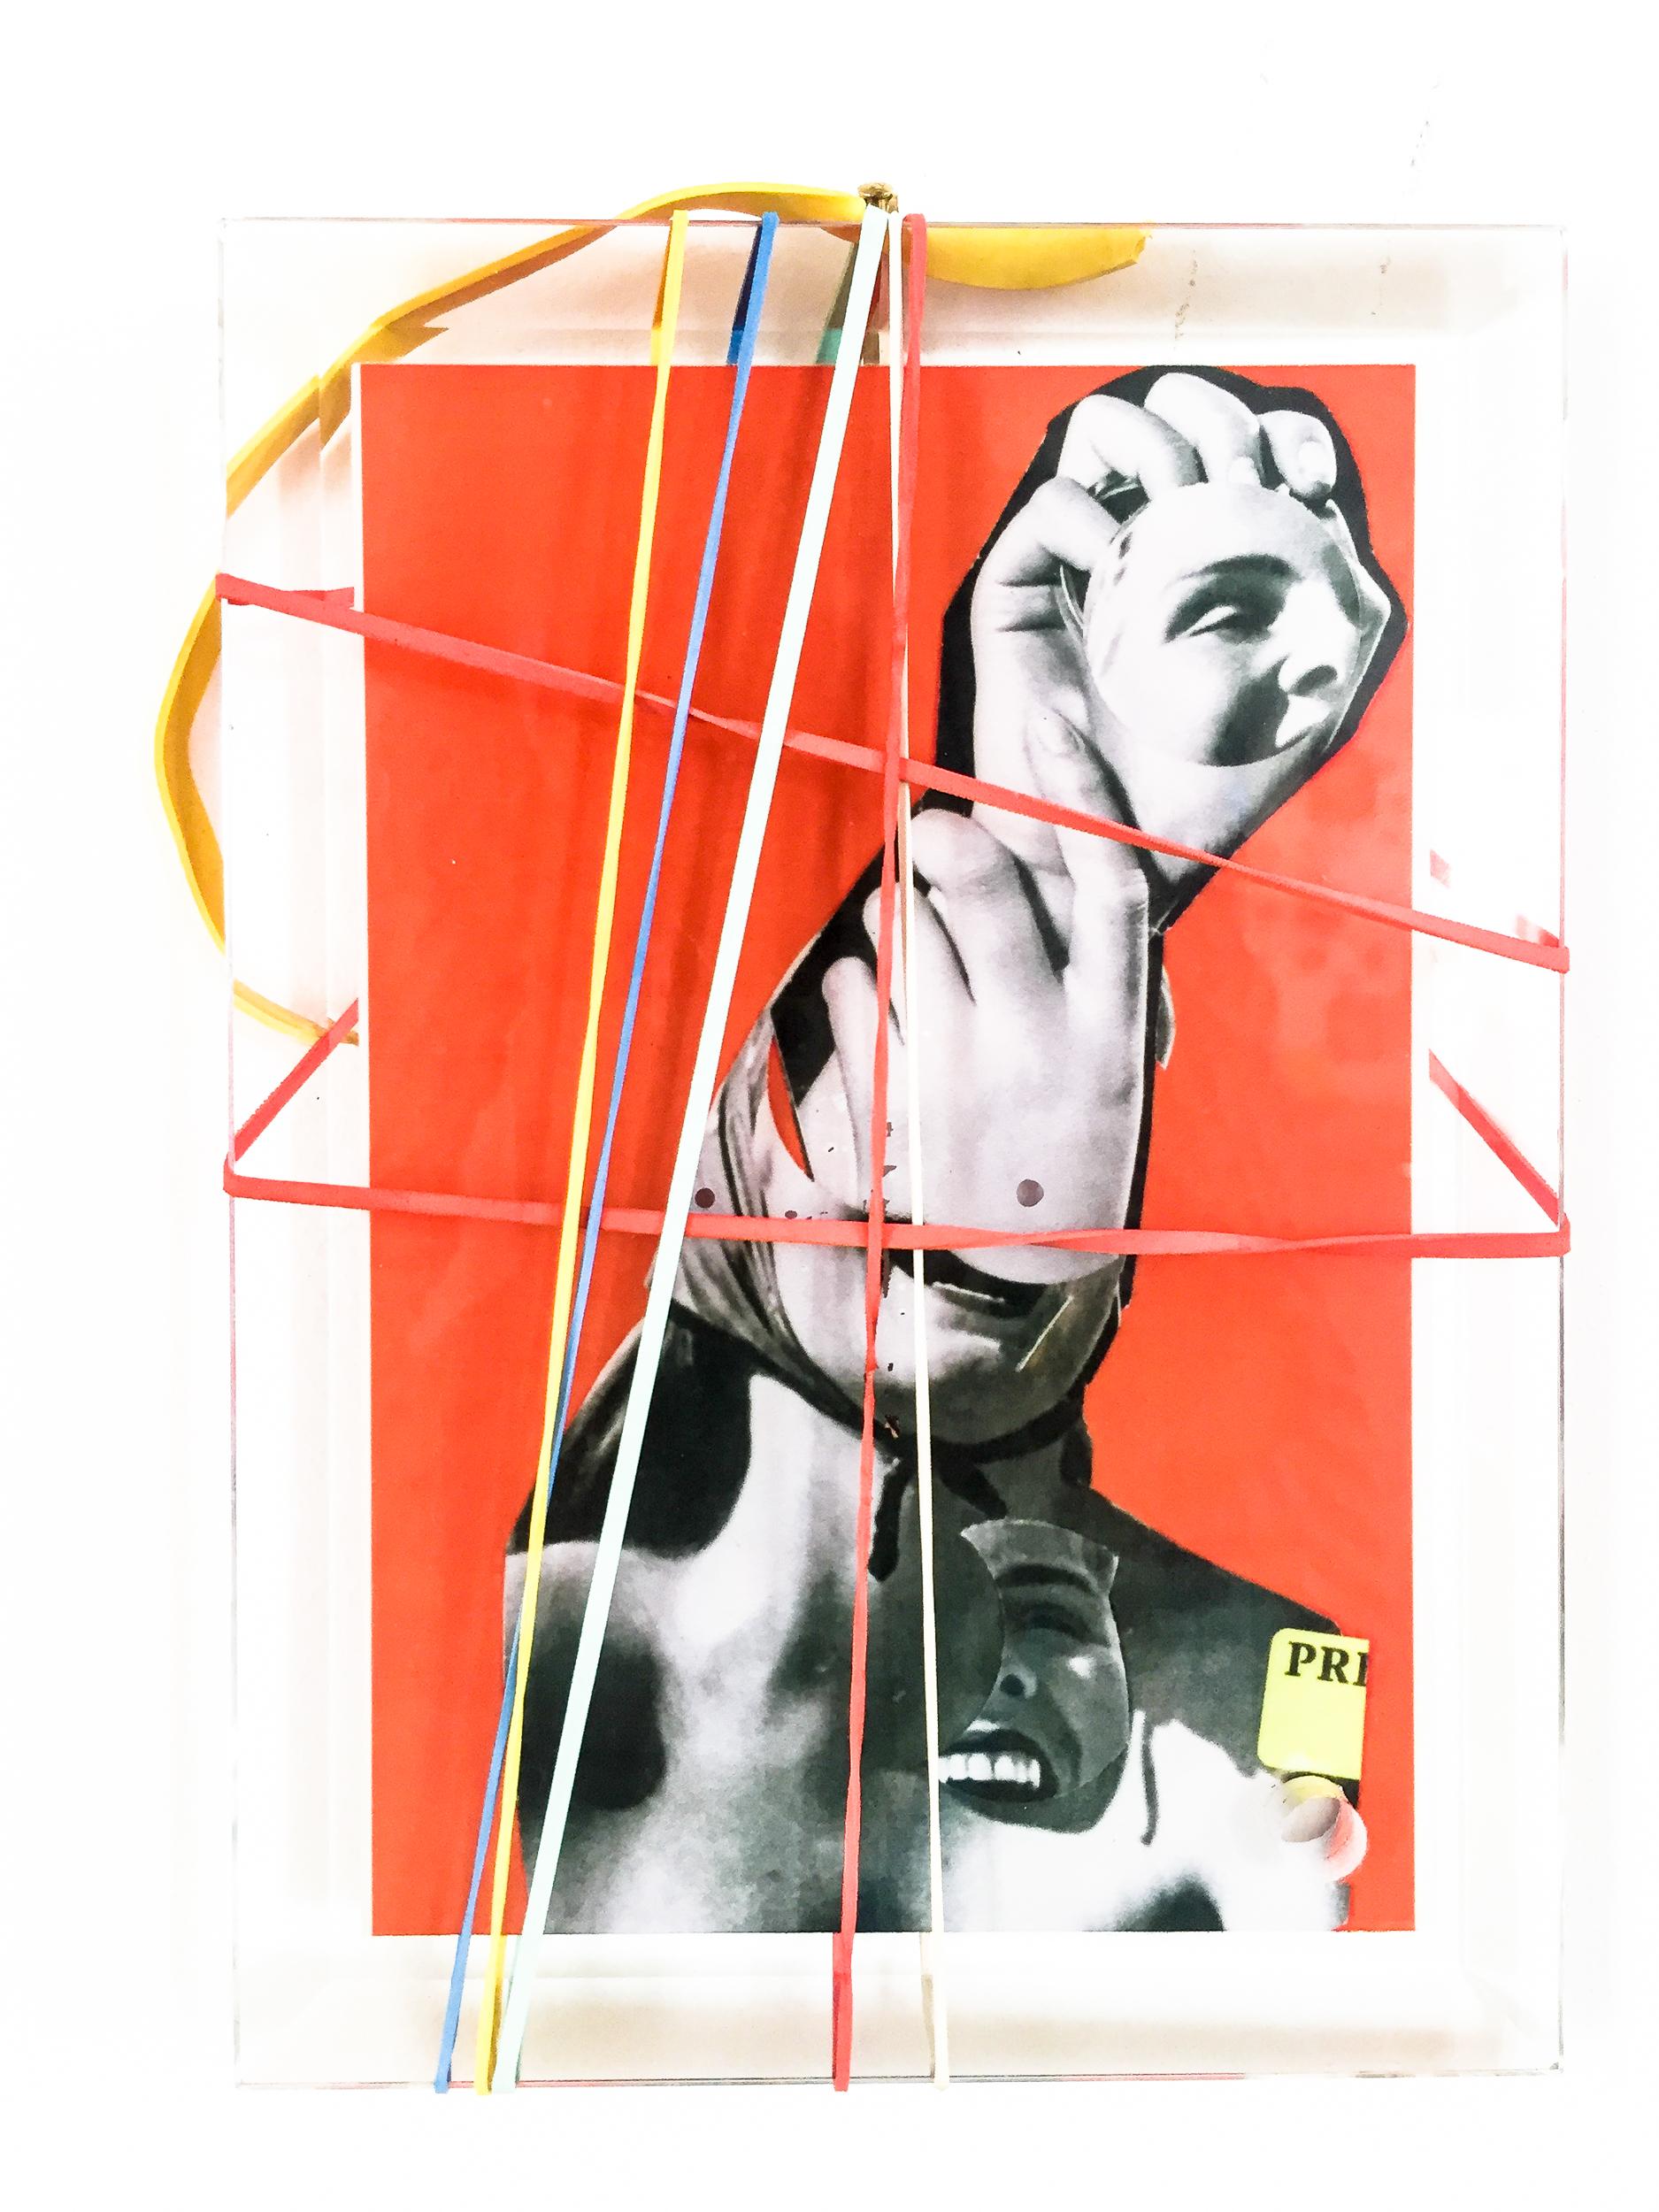 Faena-Exhibition-Images-194.jpg